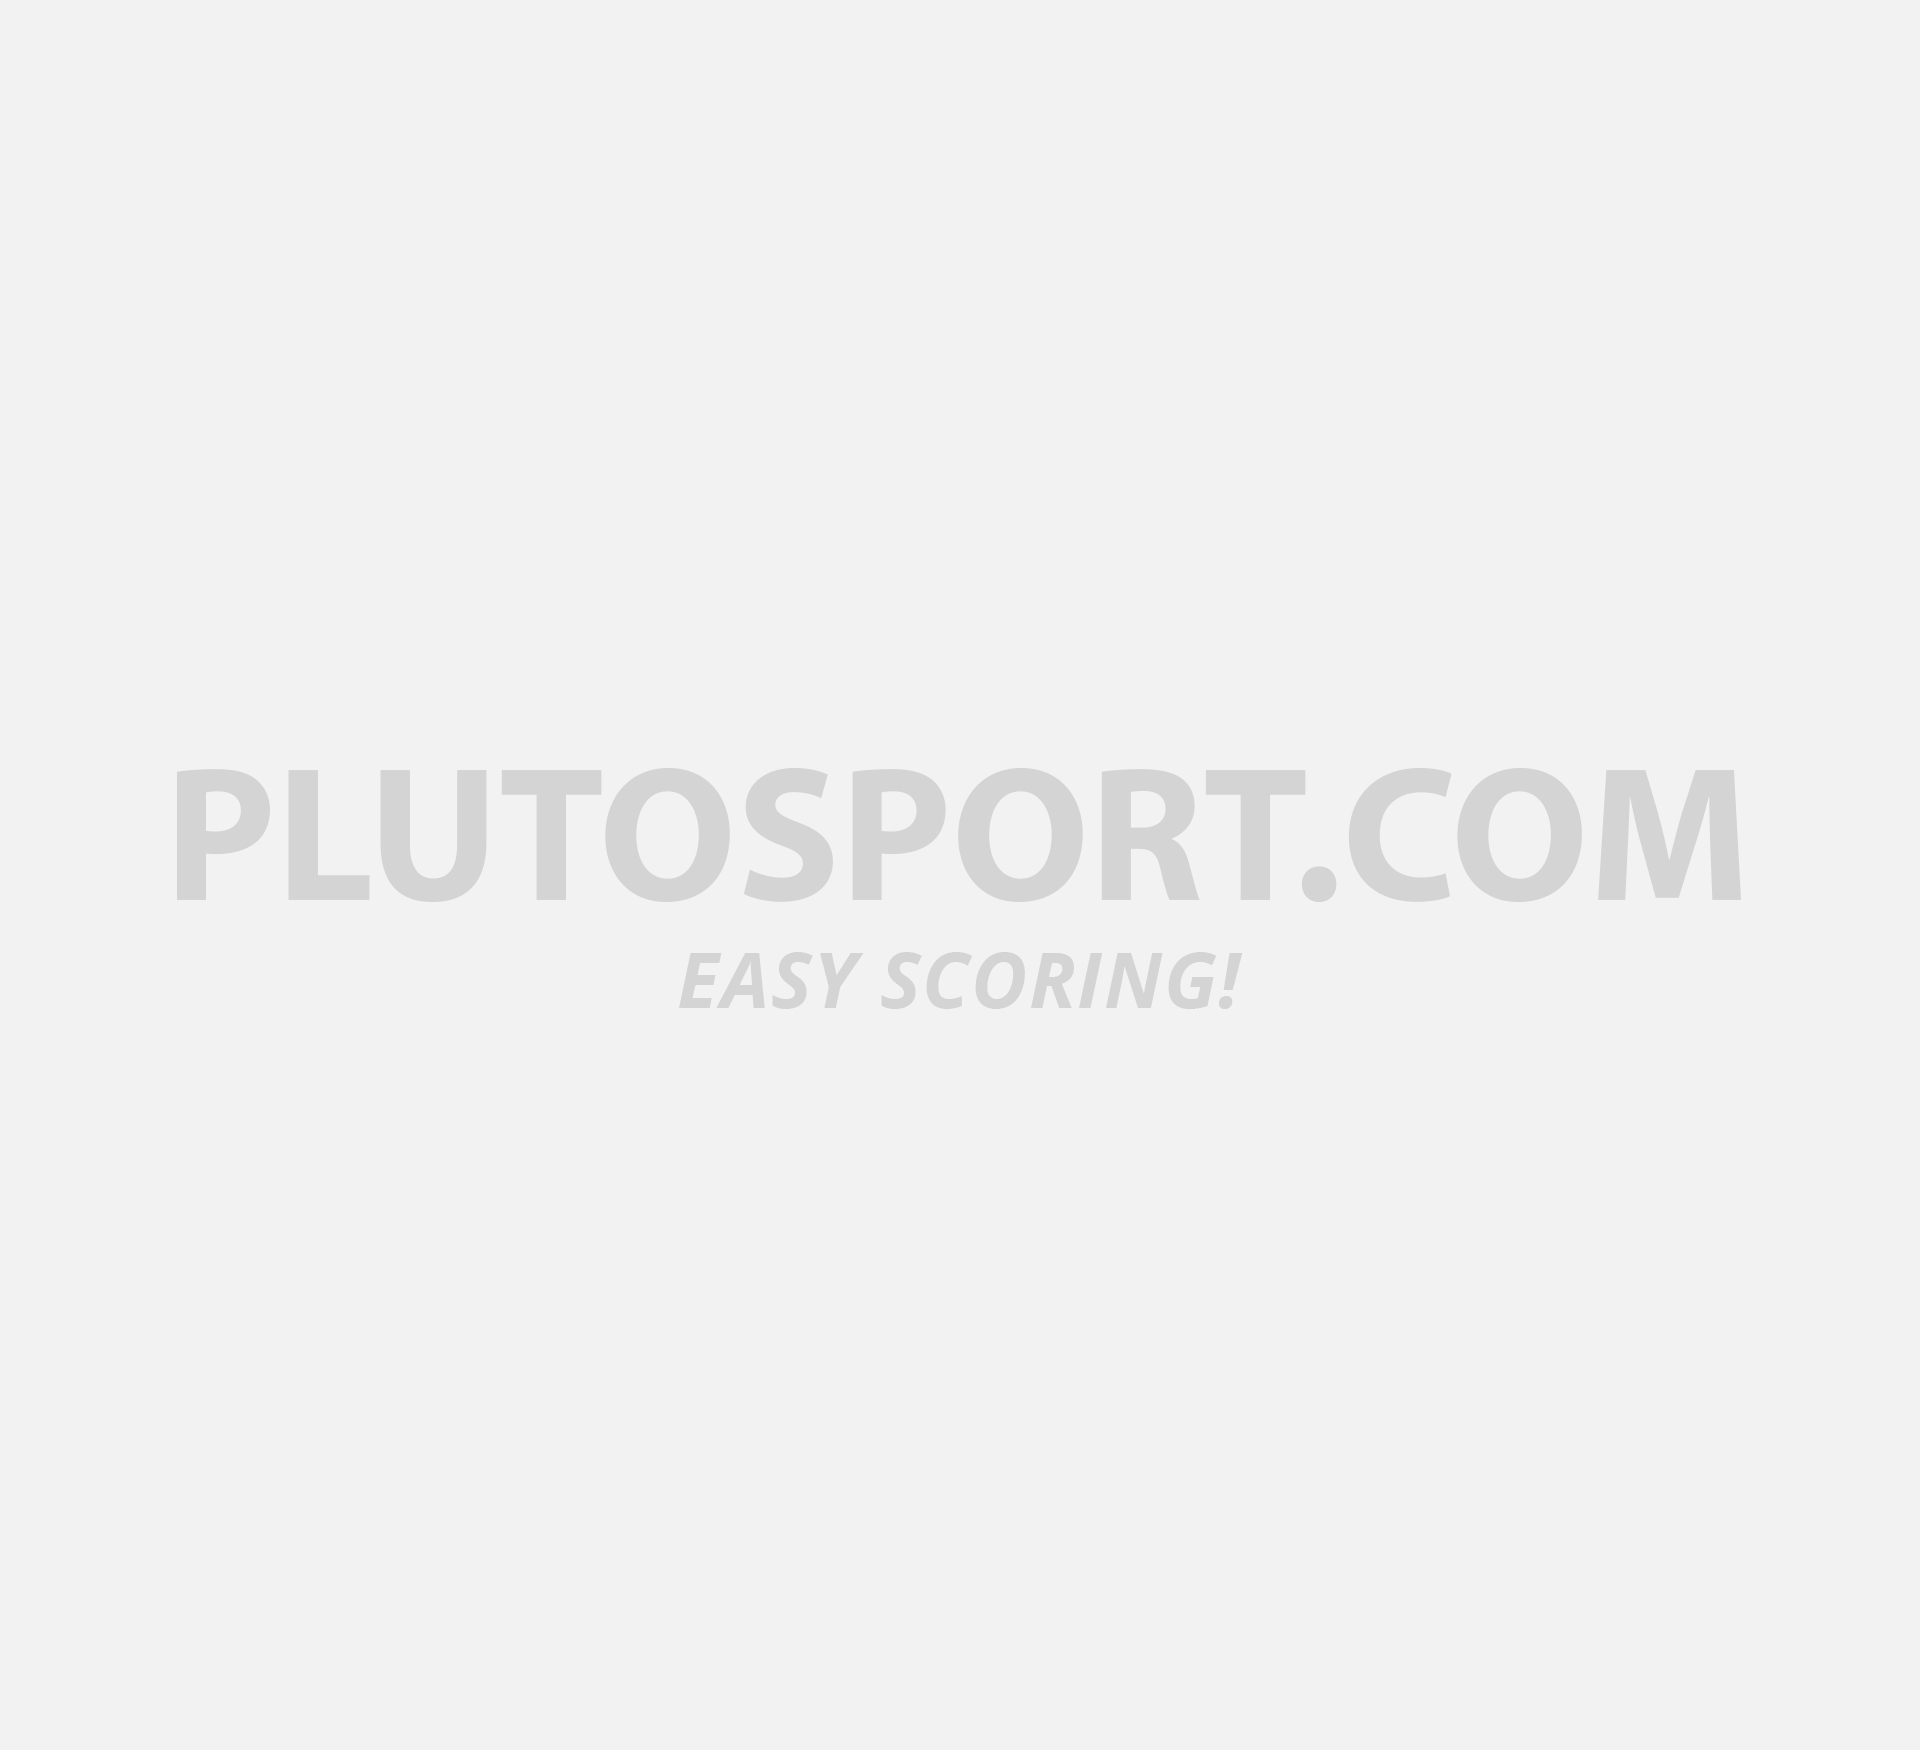 b871a3c063a Adidas F50 adiZero XTRX SG (Leather) Footballshoe - Boots screw stud - Shoes  - Football - Sports